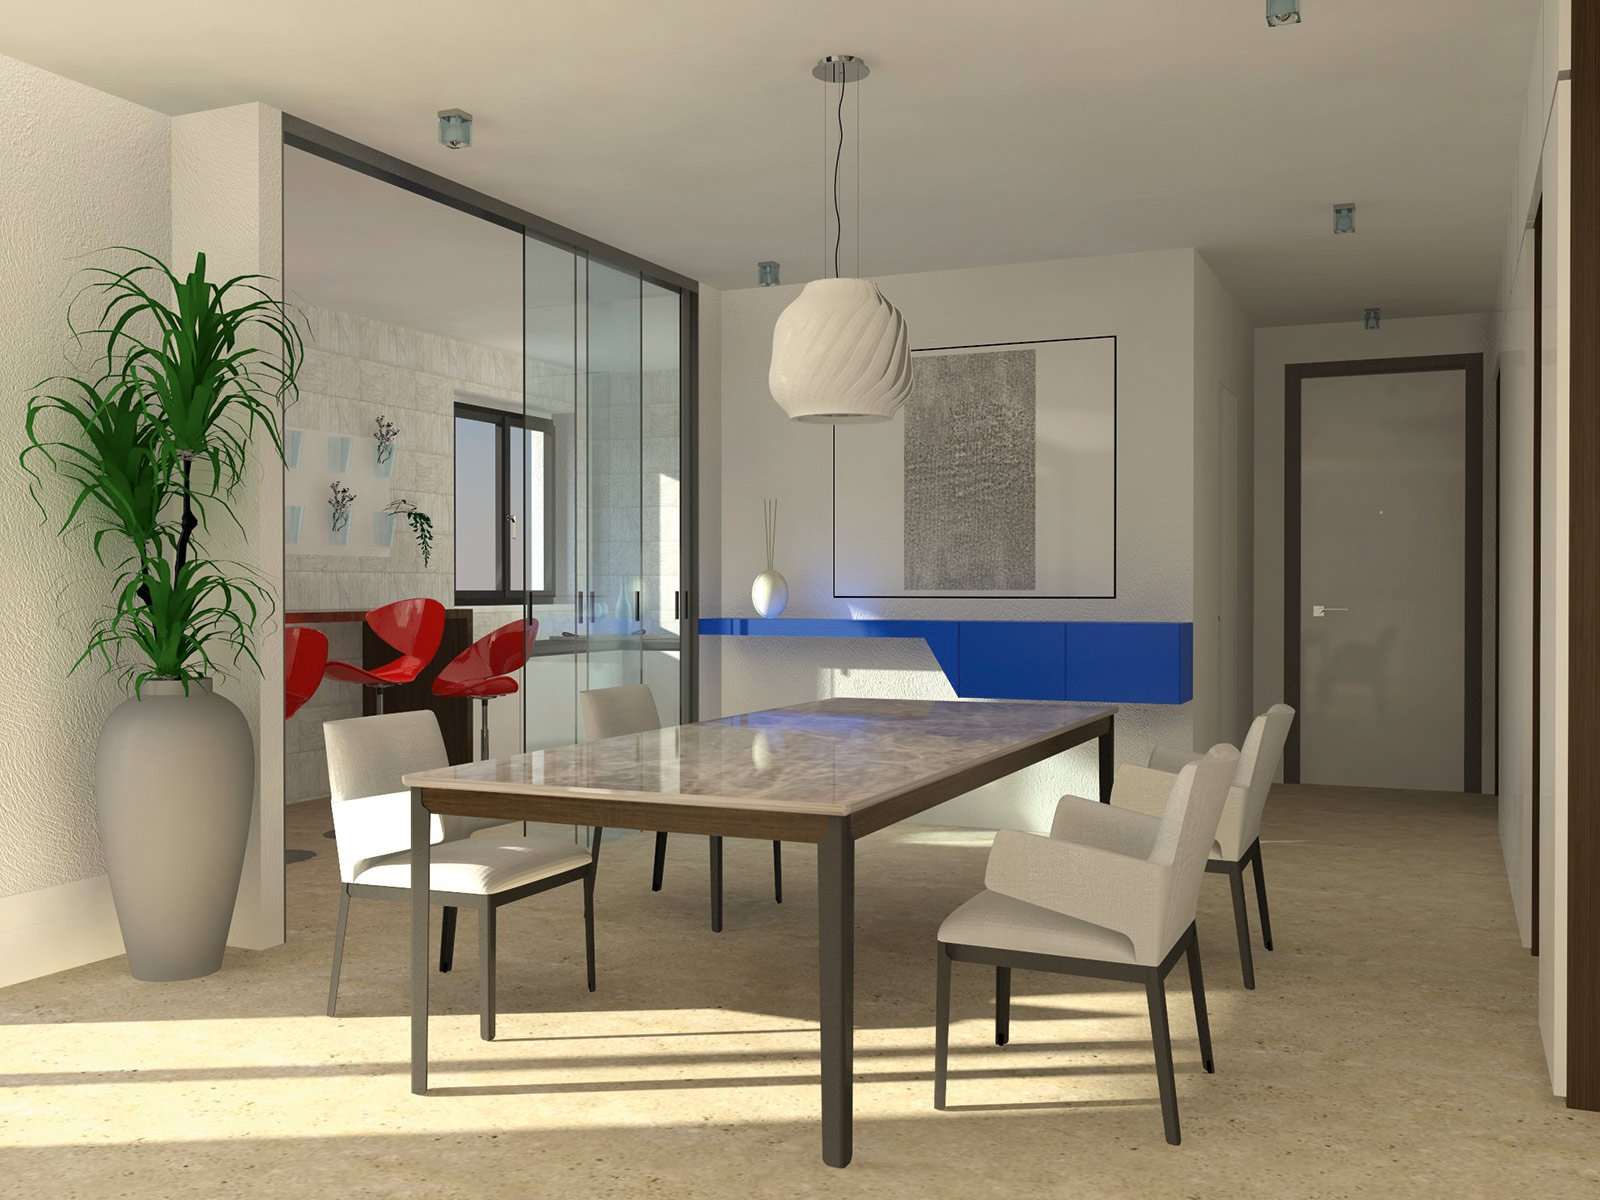 Una cucina parzialmente schermata cose di casa - Cucina con vetrata ...